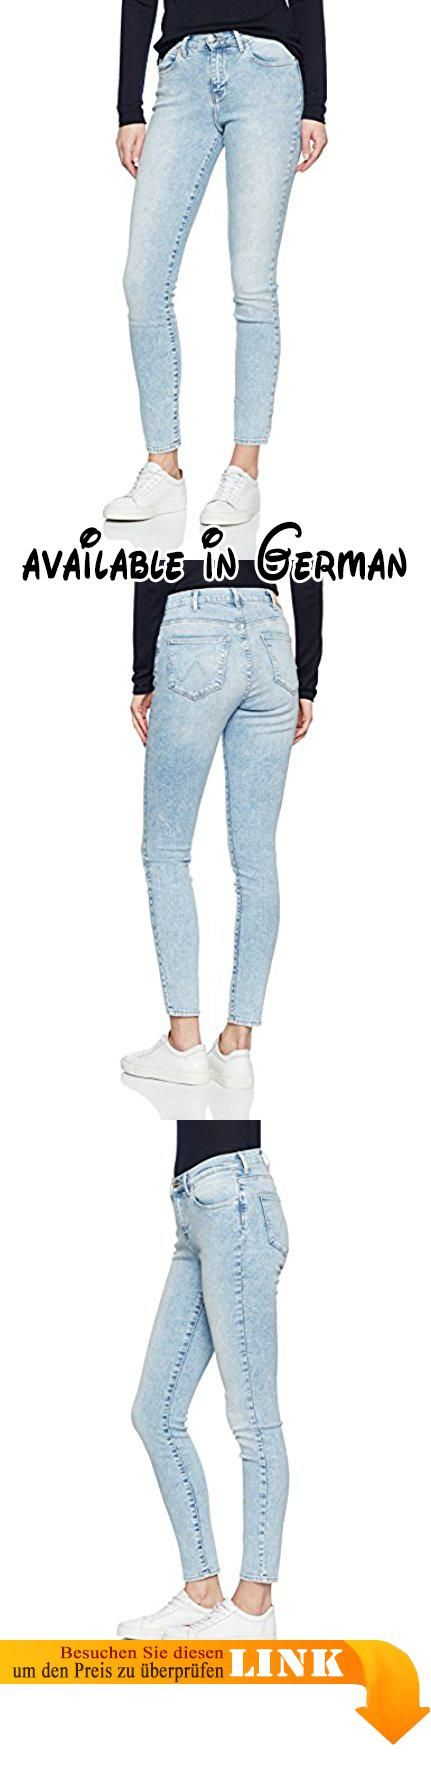 Wrangler Damen Skinny Jeanshose HIGH W27HKY86G, Gr. W30/L28, Blau (Light Marble Light Blue). Skinny #Apparel #PANTS